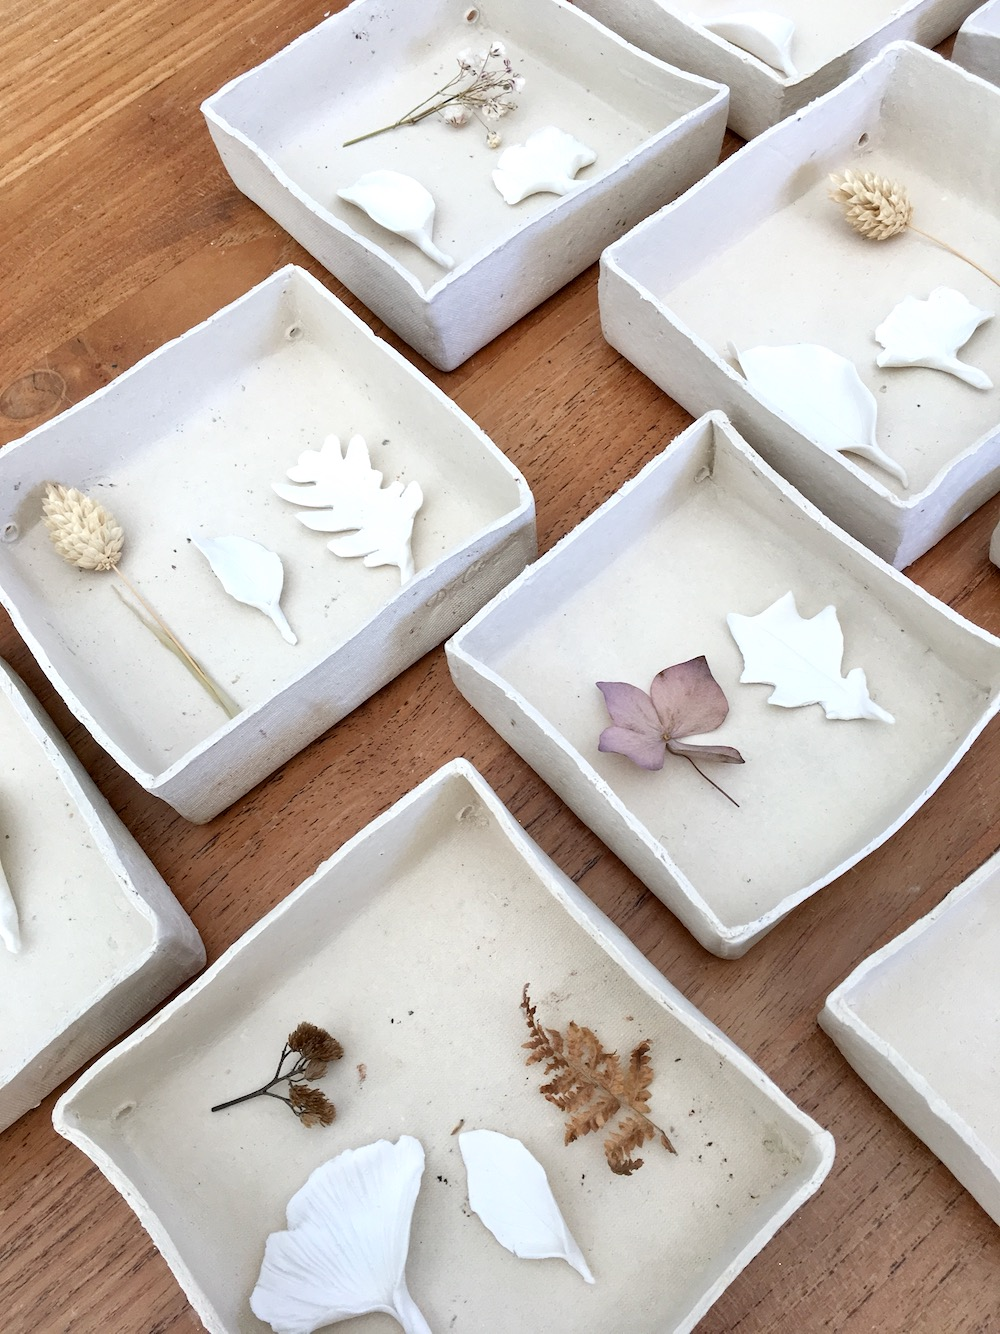 Herbiers Dai ceramic